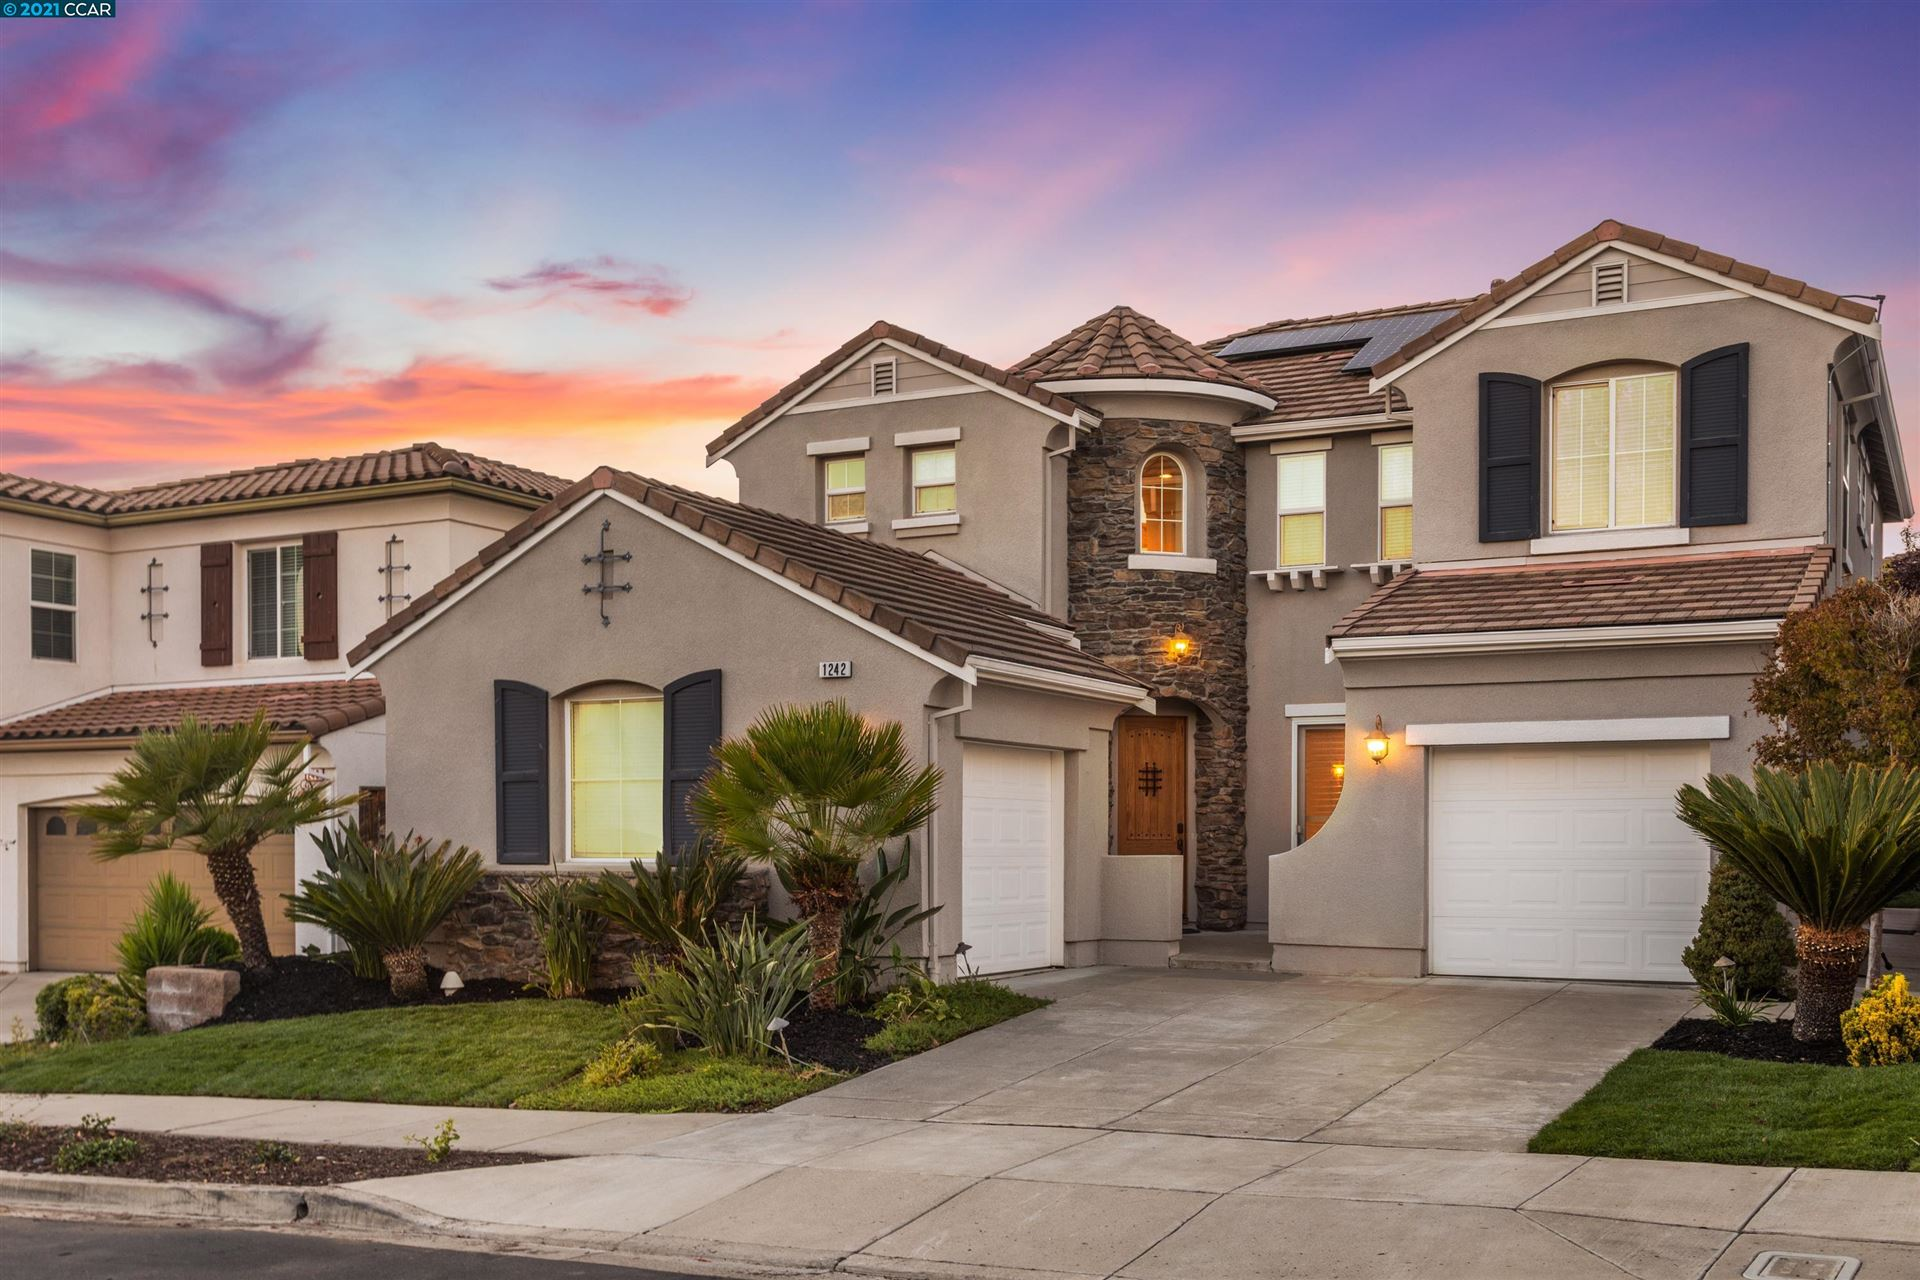 1242 Andreas Way                                                                               San Ramon                                                                      , CA - $1,799,000